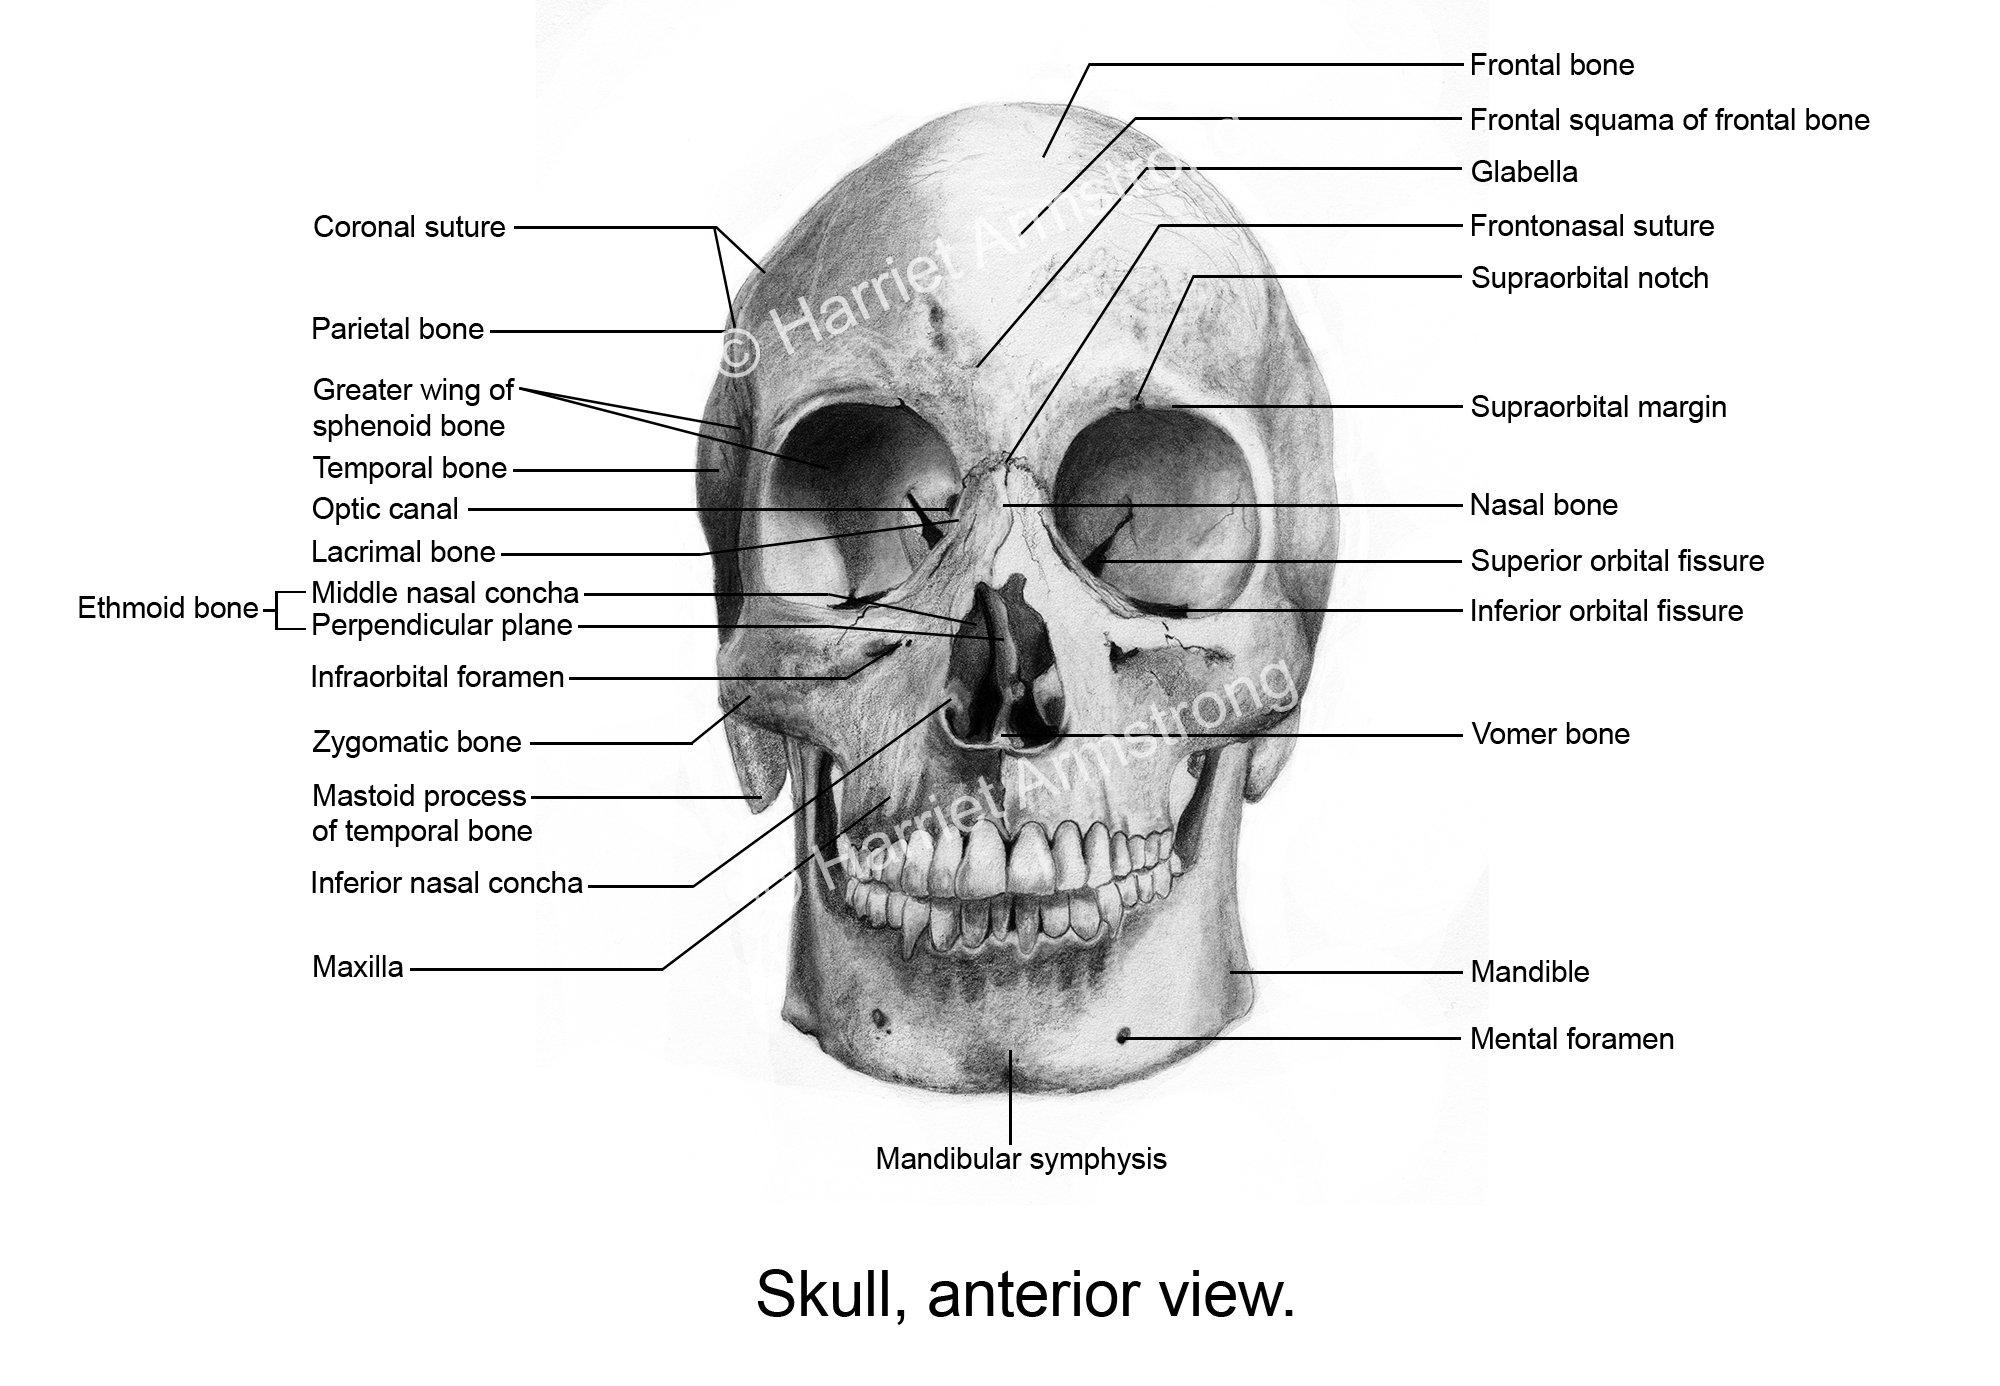 Famous Lacrimal Bone Photo - Anatomy and Physiology Tissue ...